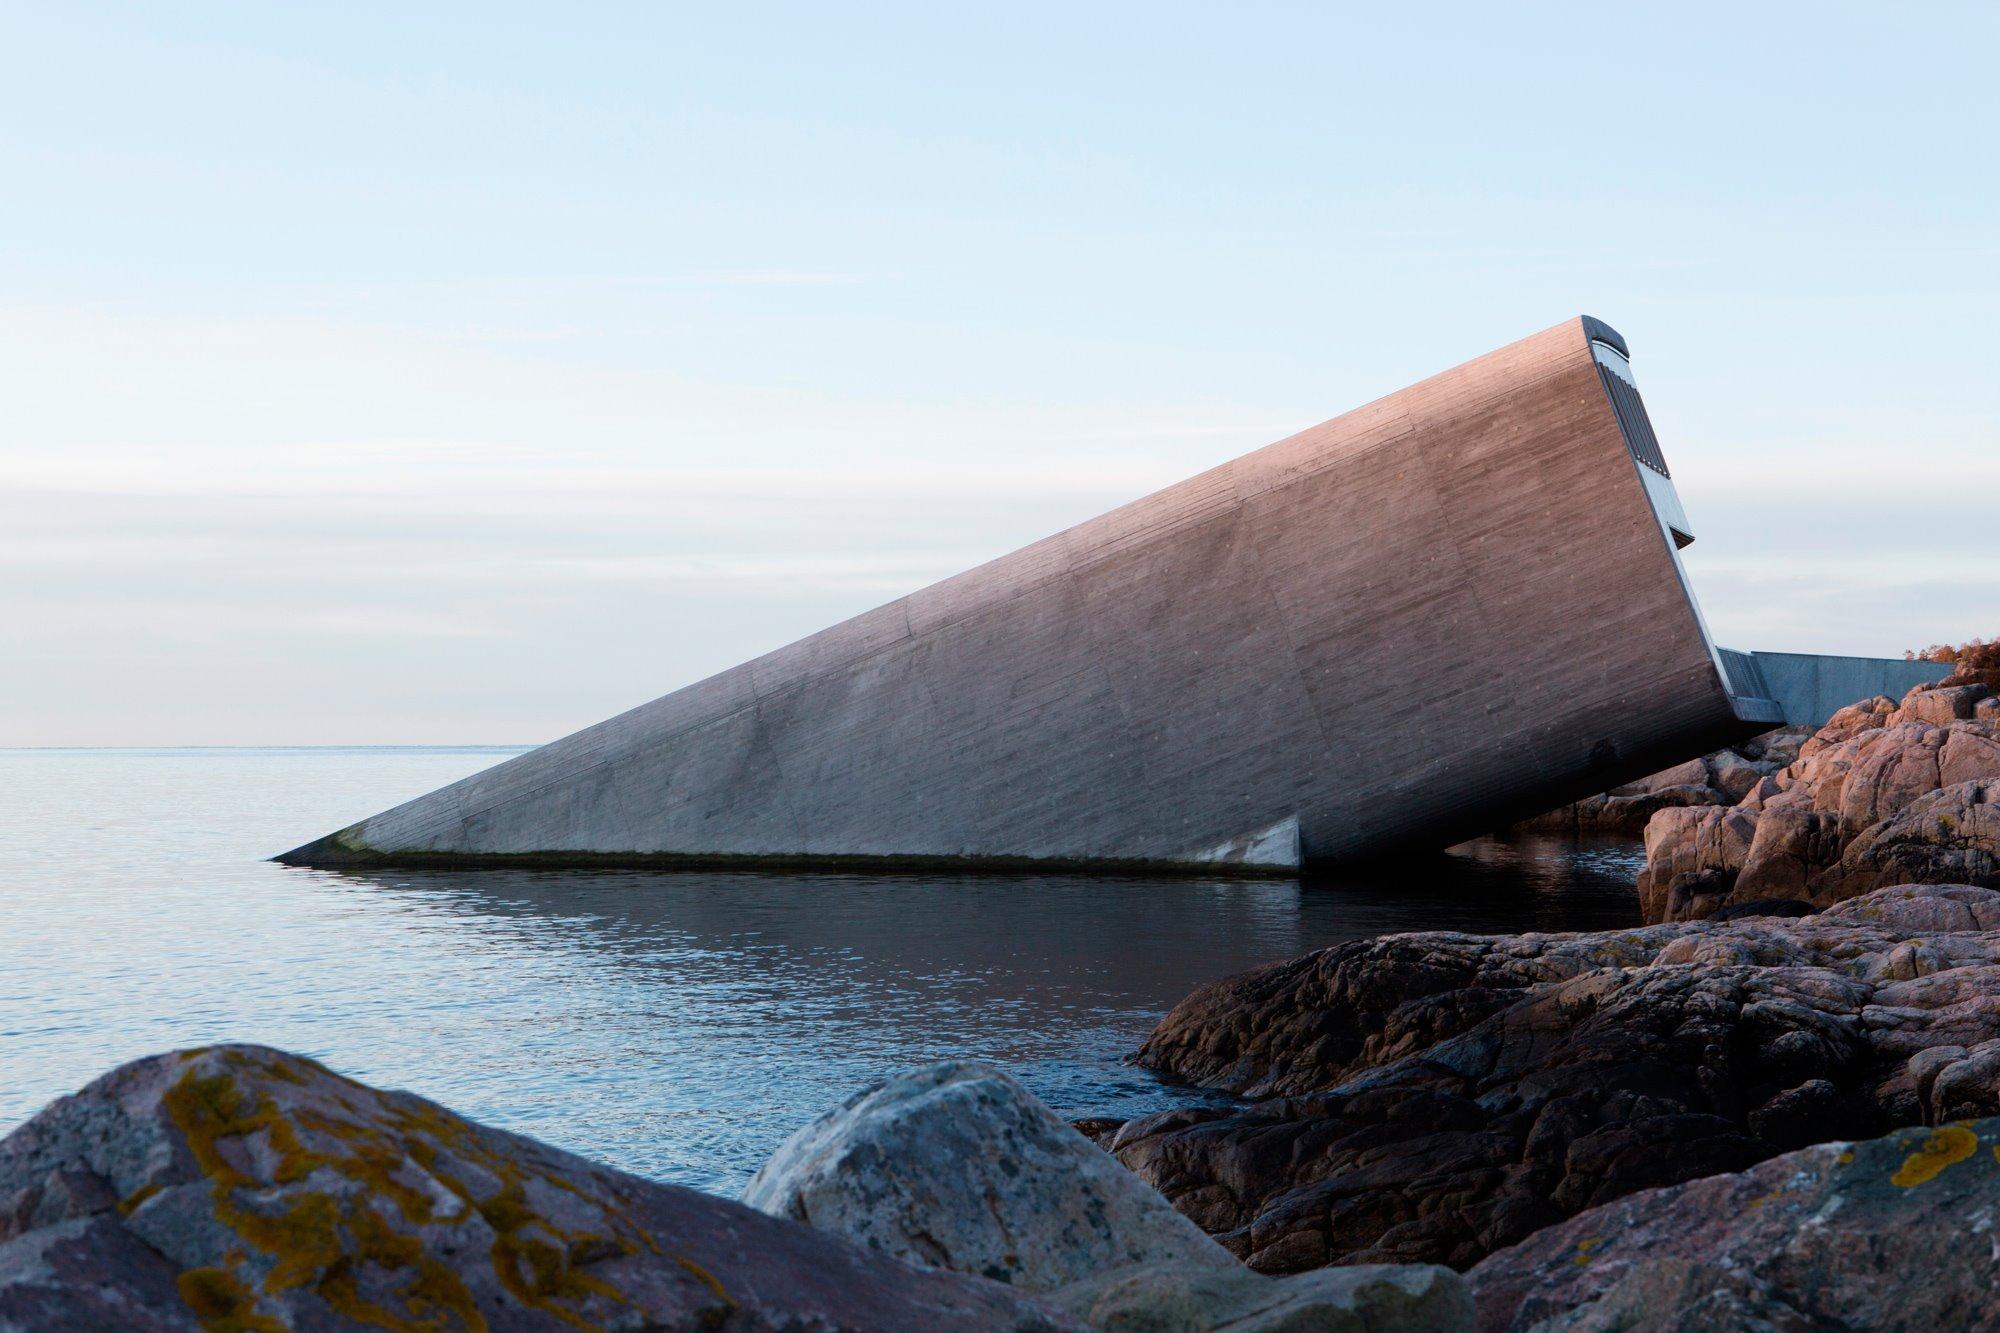 Todo sobre Under, el primer restaurante submarino de Europa